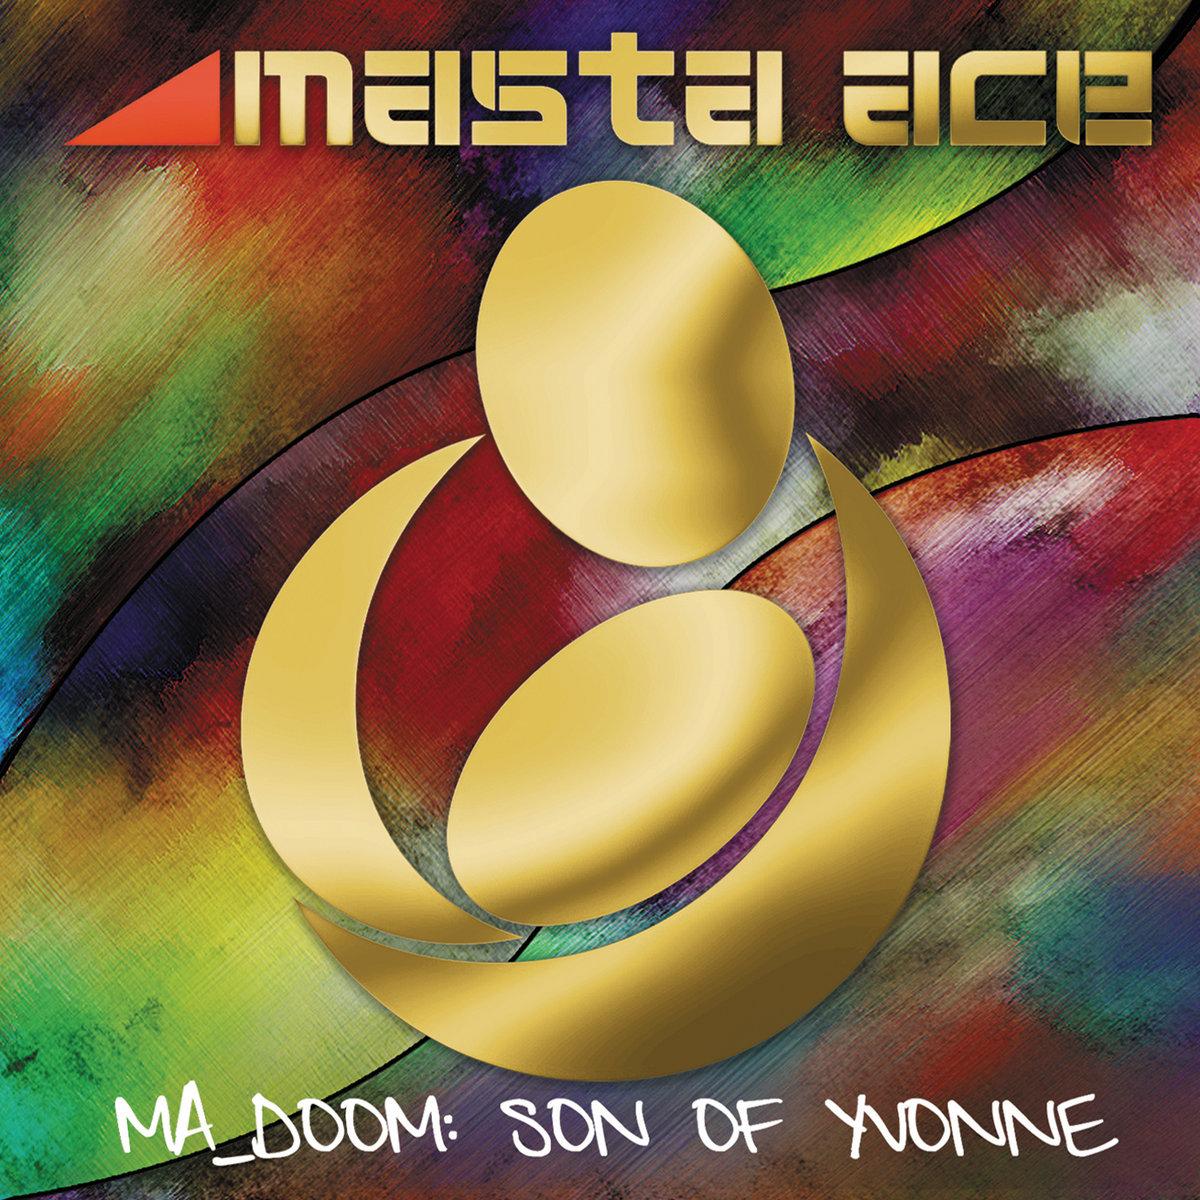 MA_DOOM: Son Of Yvonne   Fat Beats Records